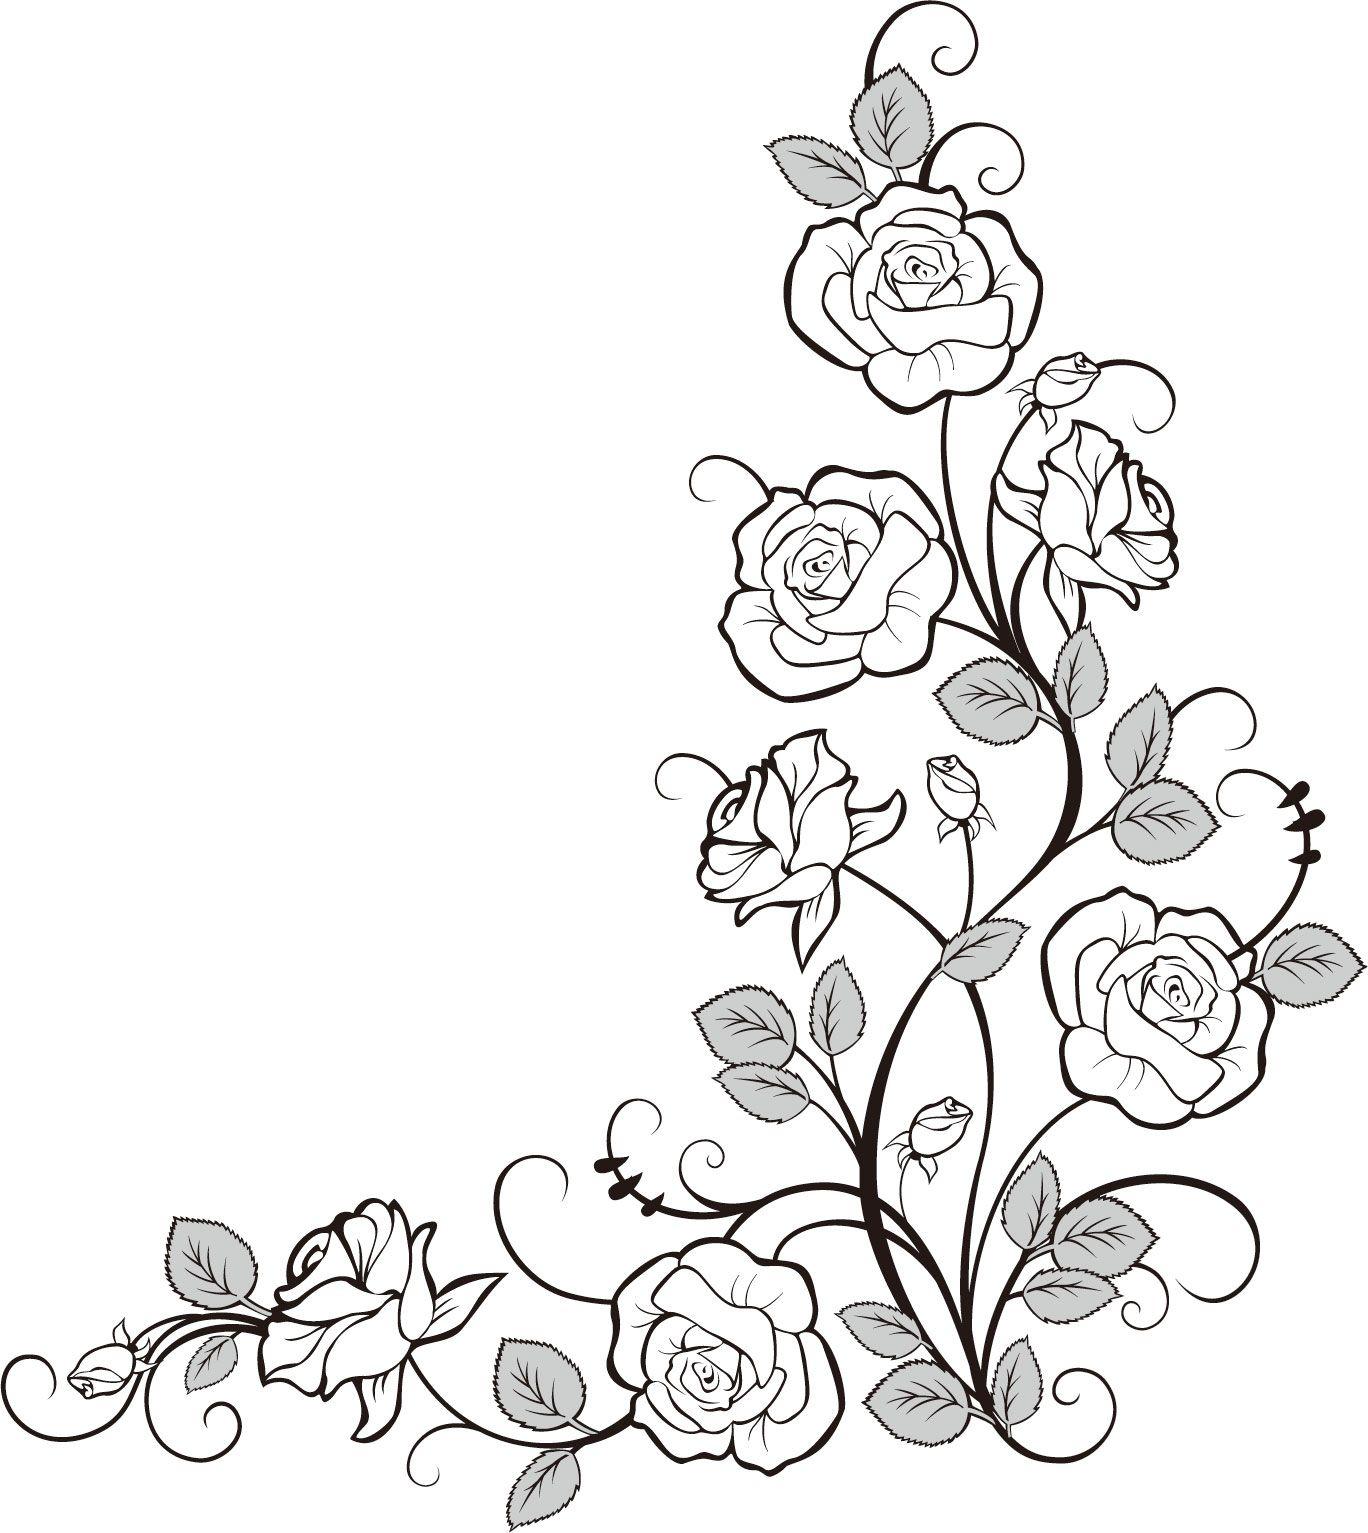 Flower border | plant Embroidery Designs | Pinterest | Flower ...